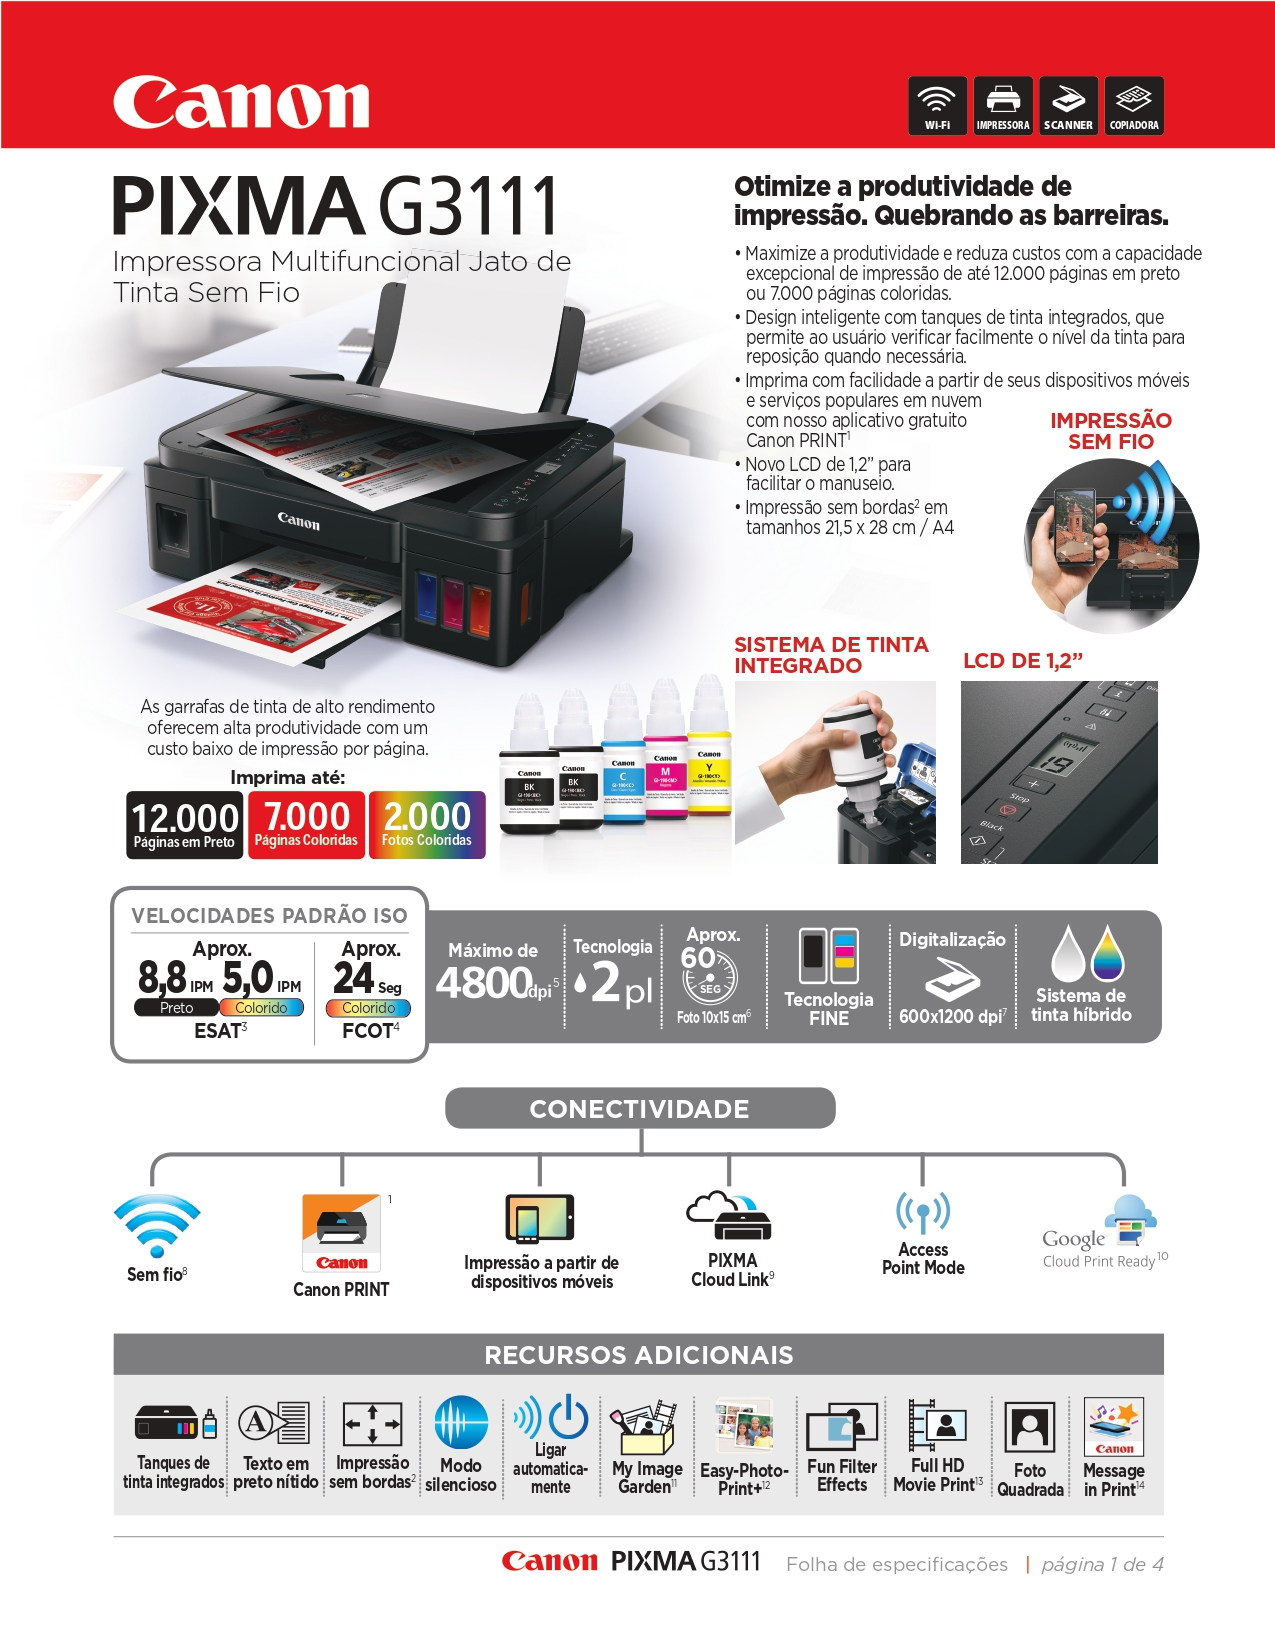 G3111_MAXXTINTA_Ficha_Técnica_PT_page-0001.jpg